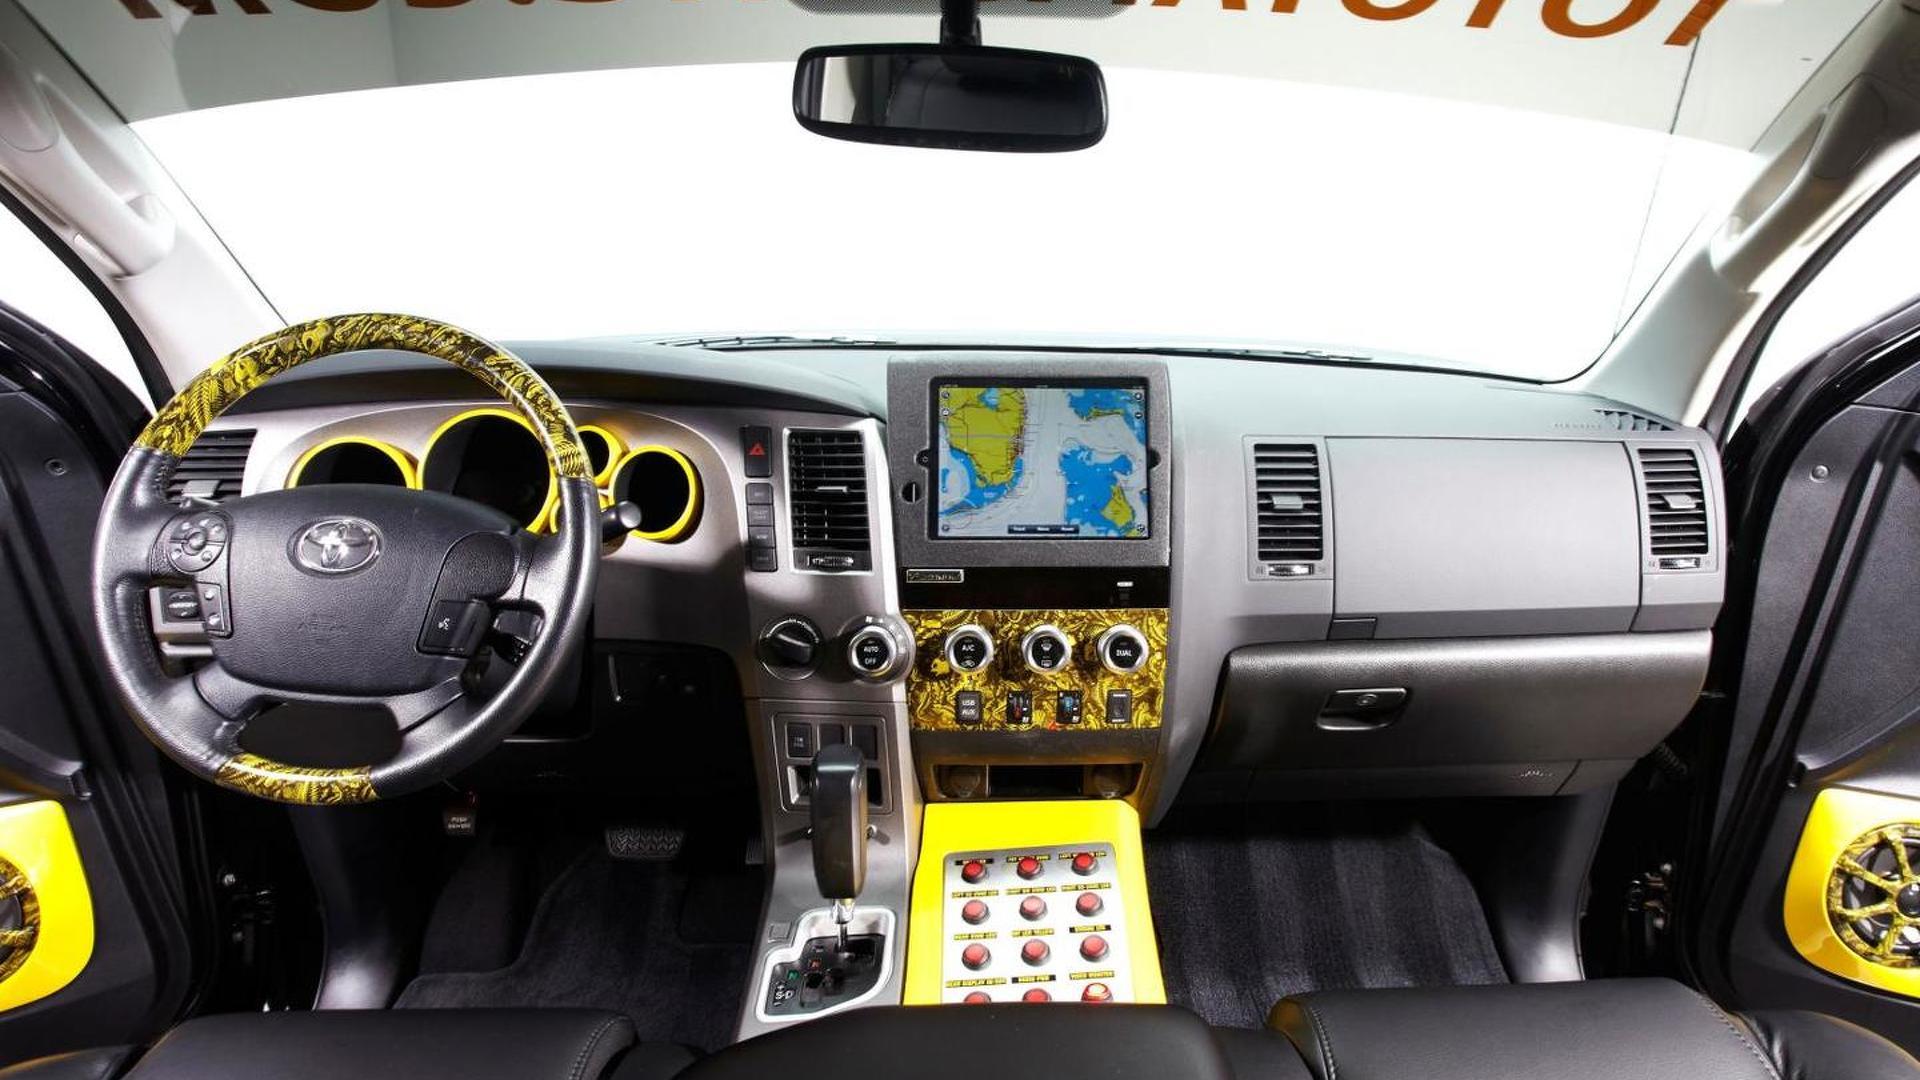 Custom Pro Bass Anglers Toyota Tundra to make debut at SEMA